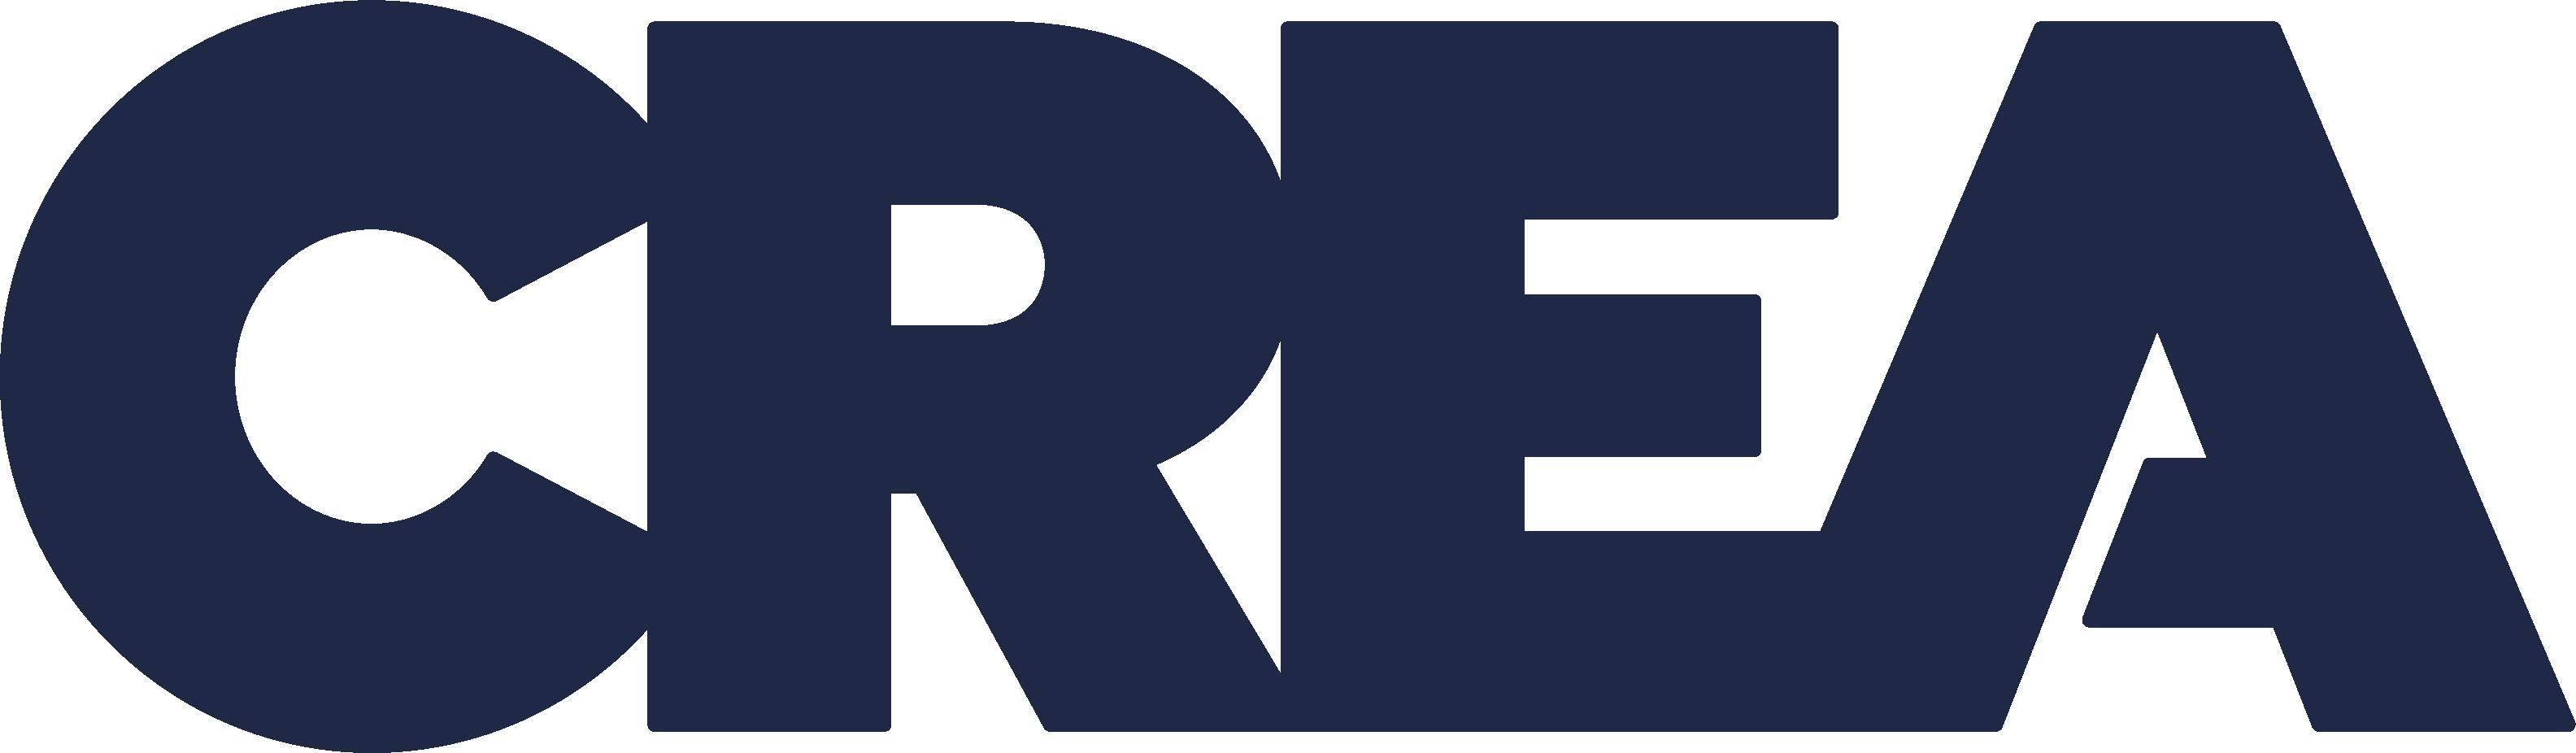 Tee Sponsor - CREA, LLC - Logo